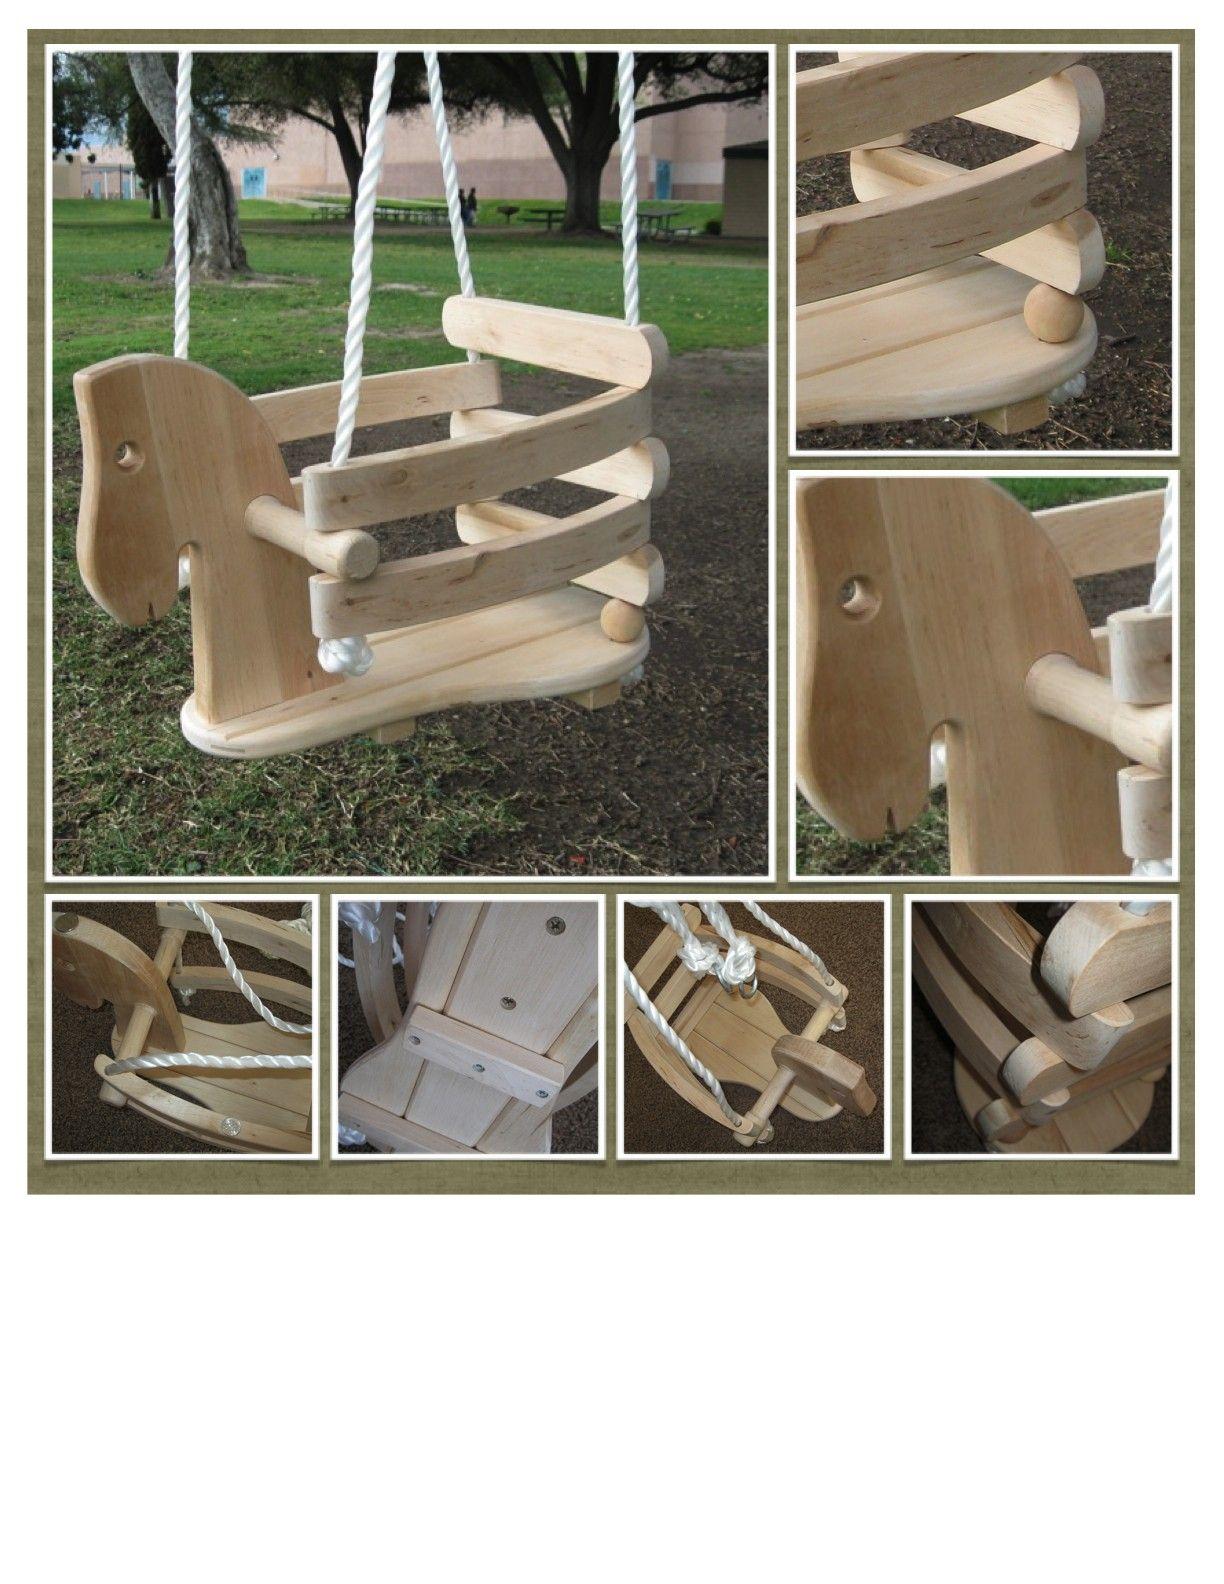 Child Wooden Horse Swing Kids Outdoor Furniture Outdoor Furniture Plans Horse Swing